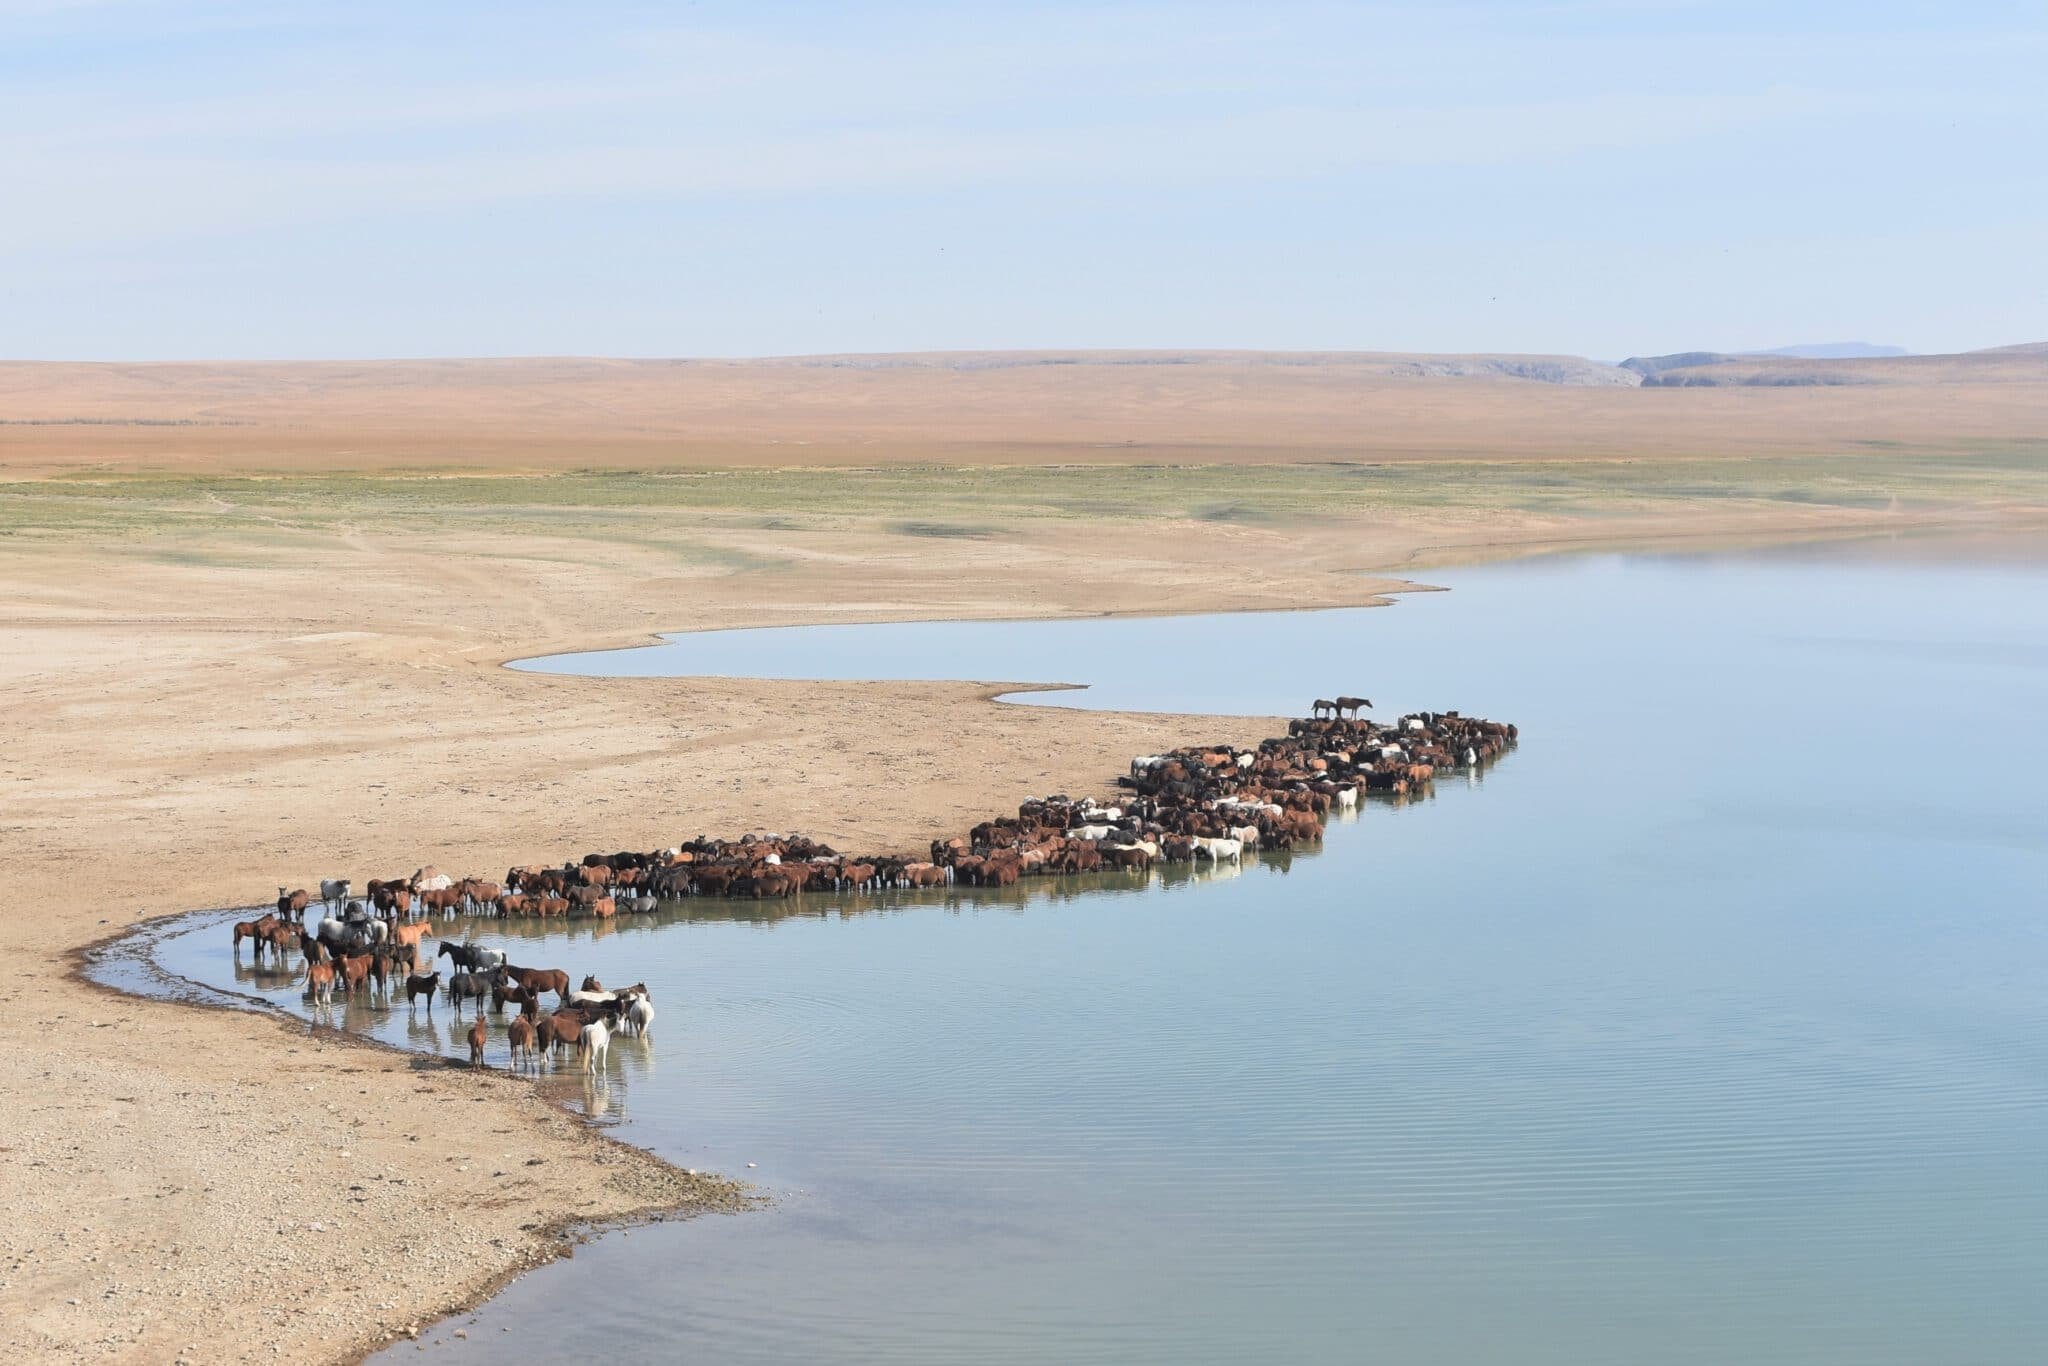 Info Shymkent - Horses (Equus caballus) at a River in the steppe near Shymkent in Kazakhstan (Photo: Qudaibergen Amirkulov)